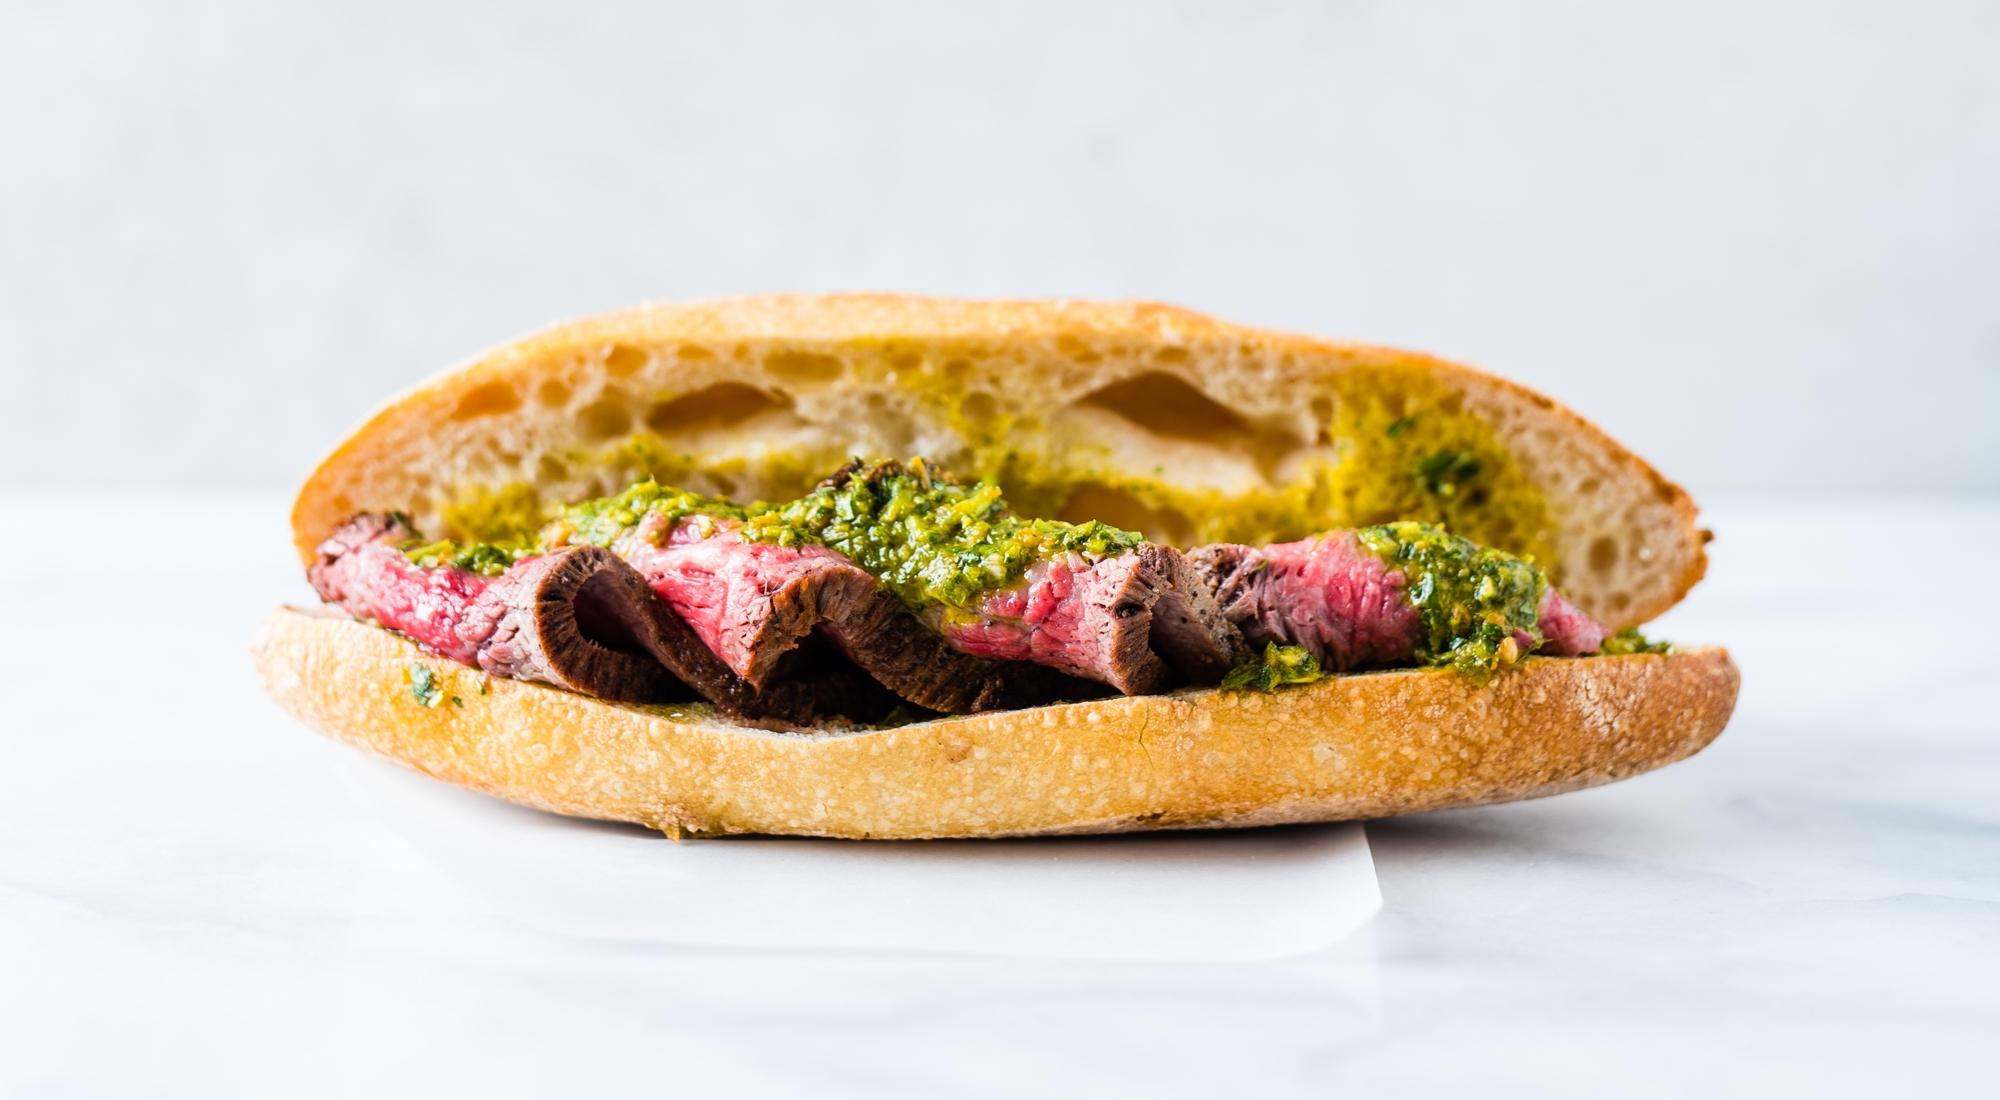 Steak +Salsa Verde - ROASTED TRI-TIP, SALSA VERDE, TUNISIAN OLIVE OIL, BAGUETTE